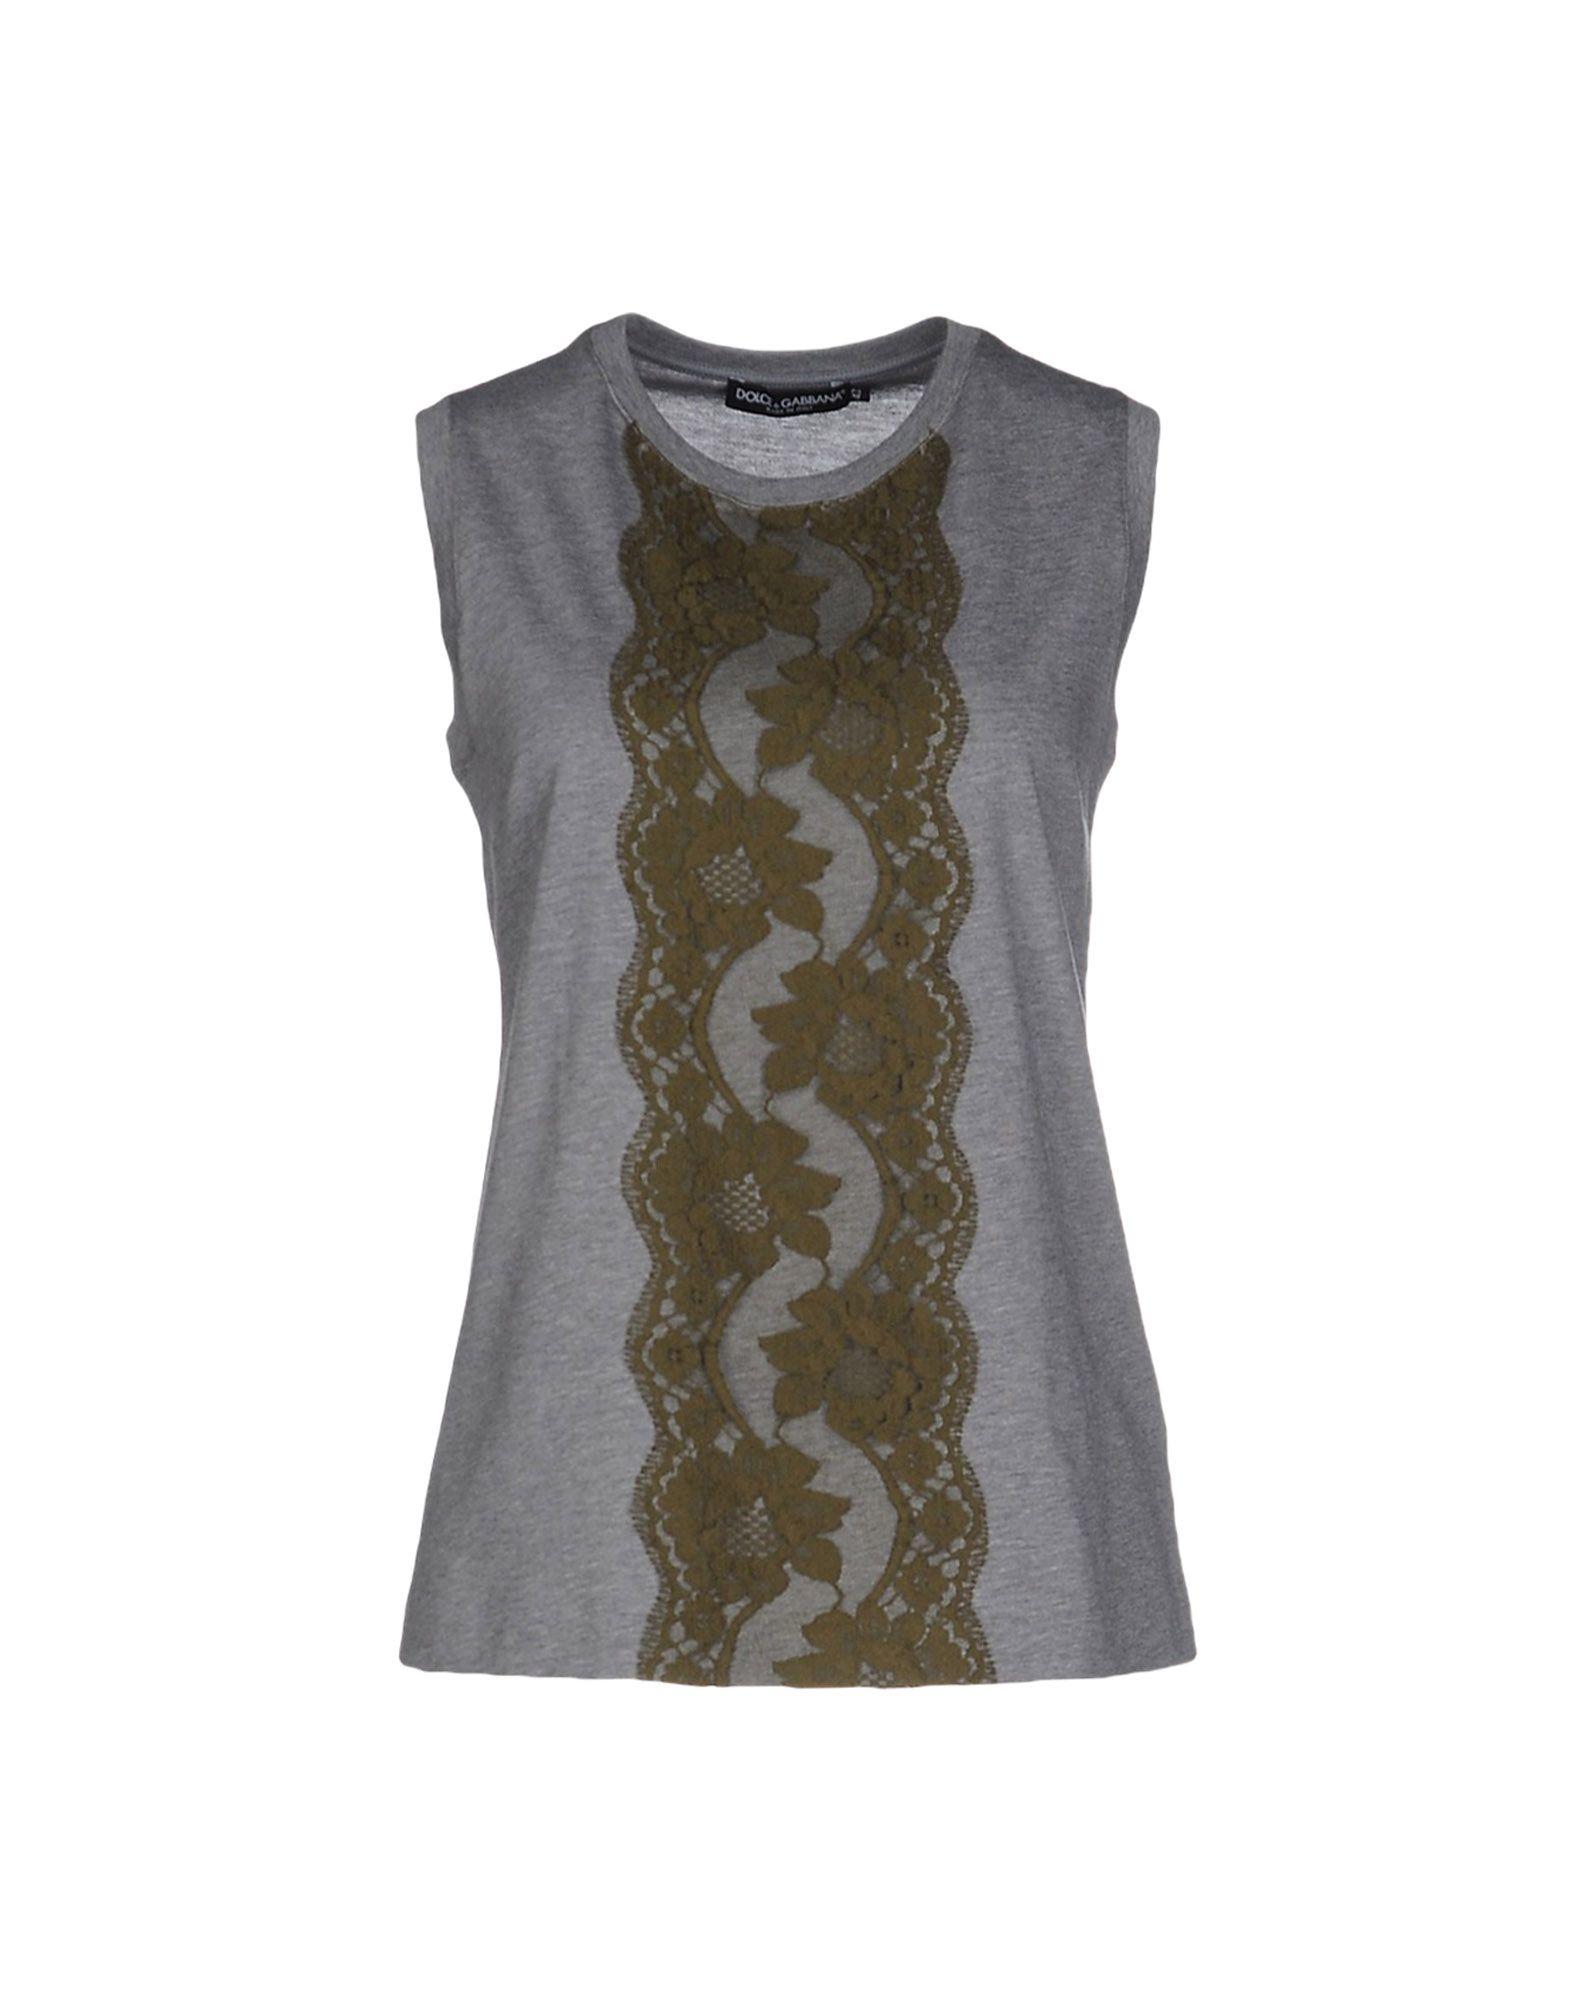 dolce gabbana t shirt in gray grey lyst. Black Bedroom Furniture Sets. Home Design Ideas